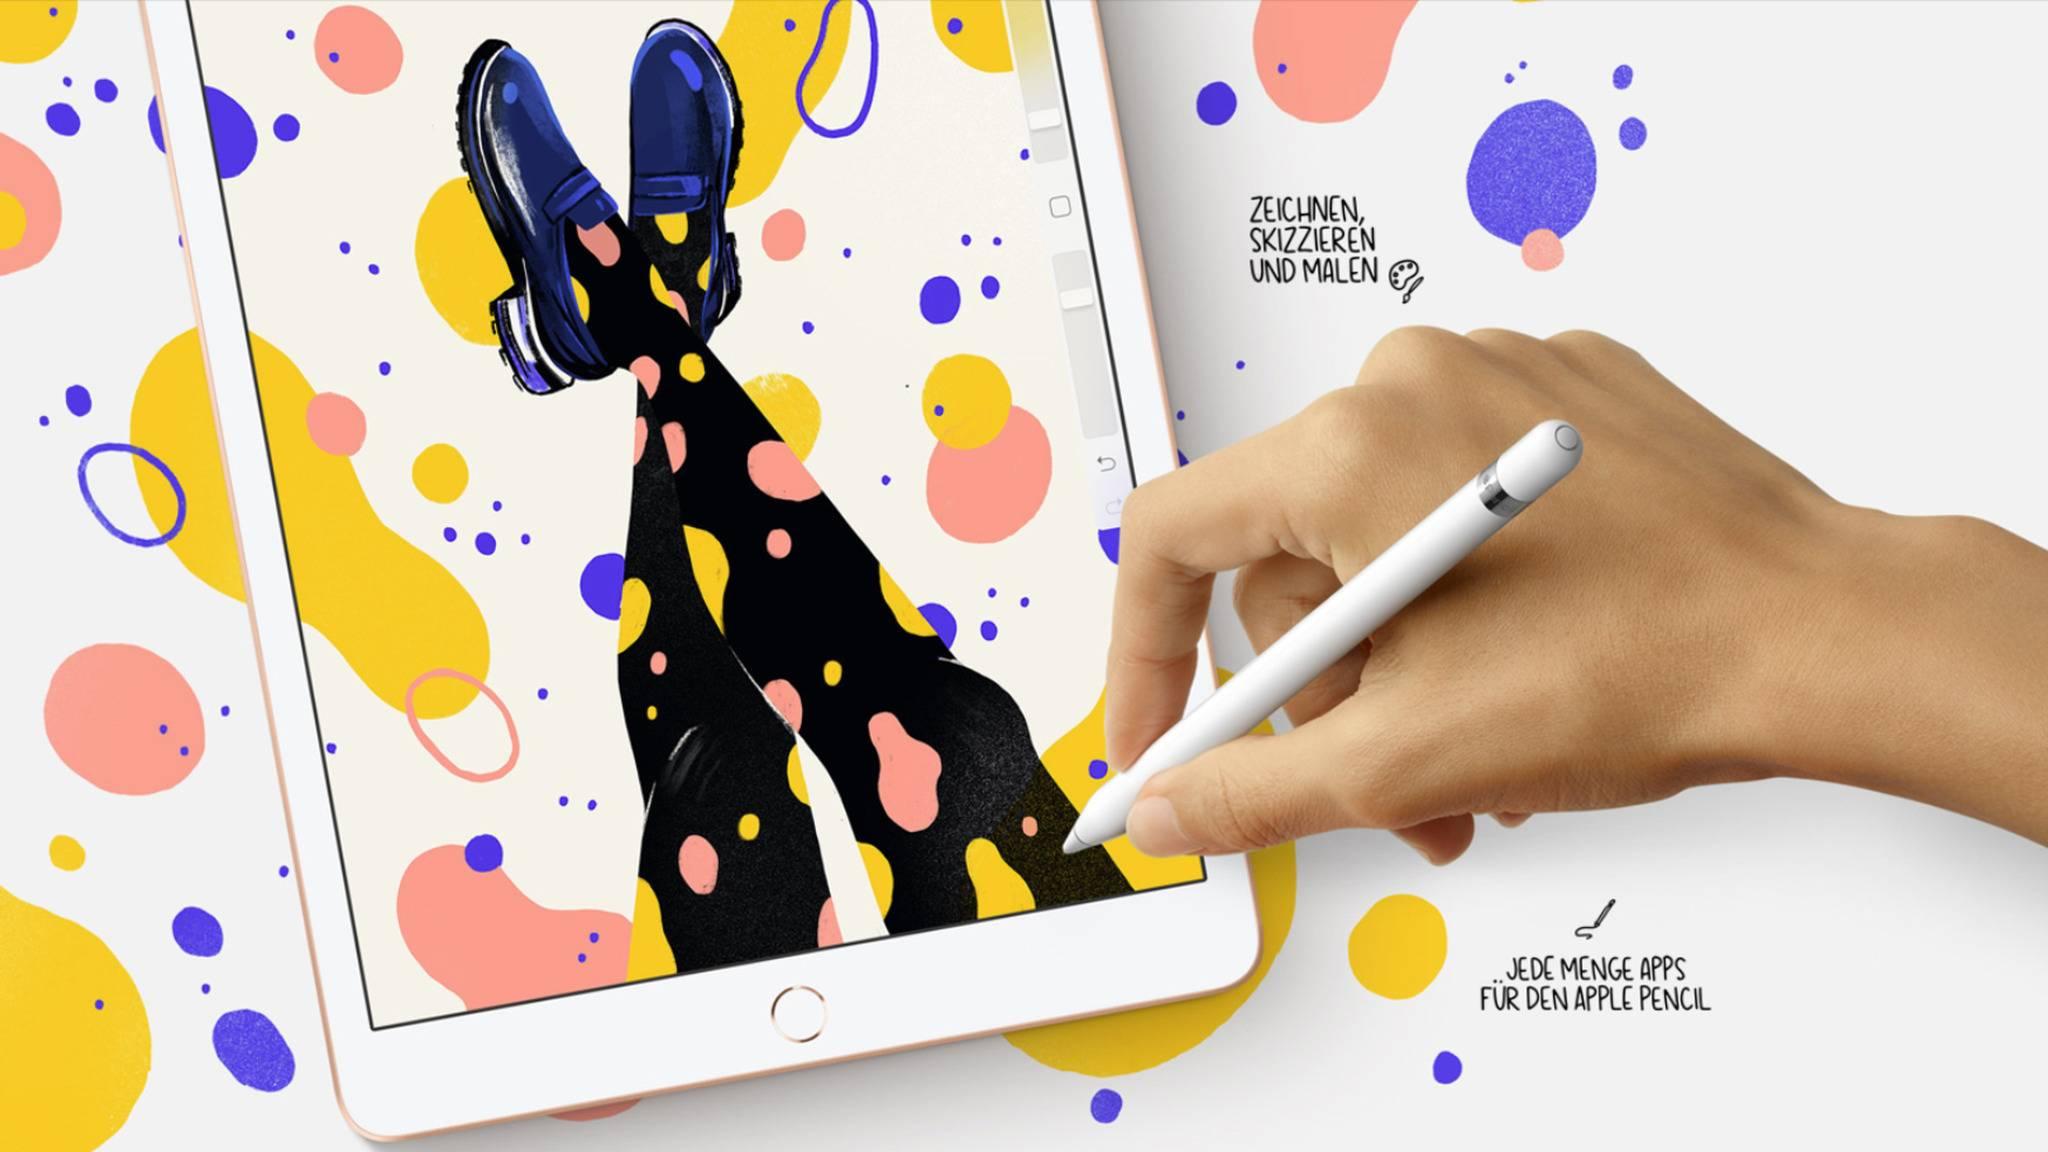 apple-ipad-pencil-2019